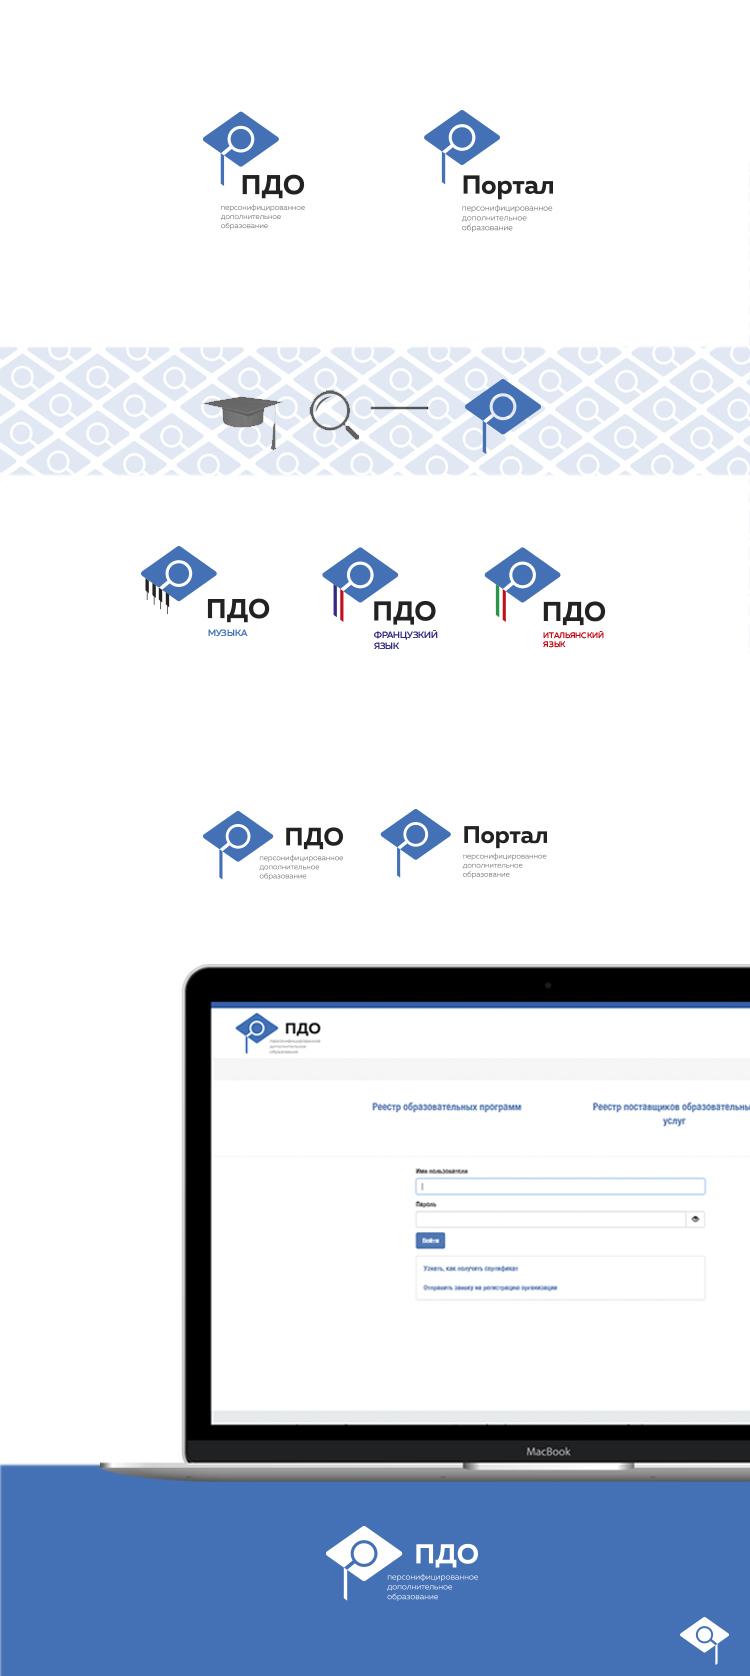 Логотип для интернет-портала фото f_8285a44e4350e269.jpg